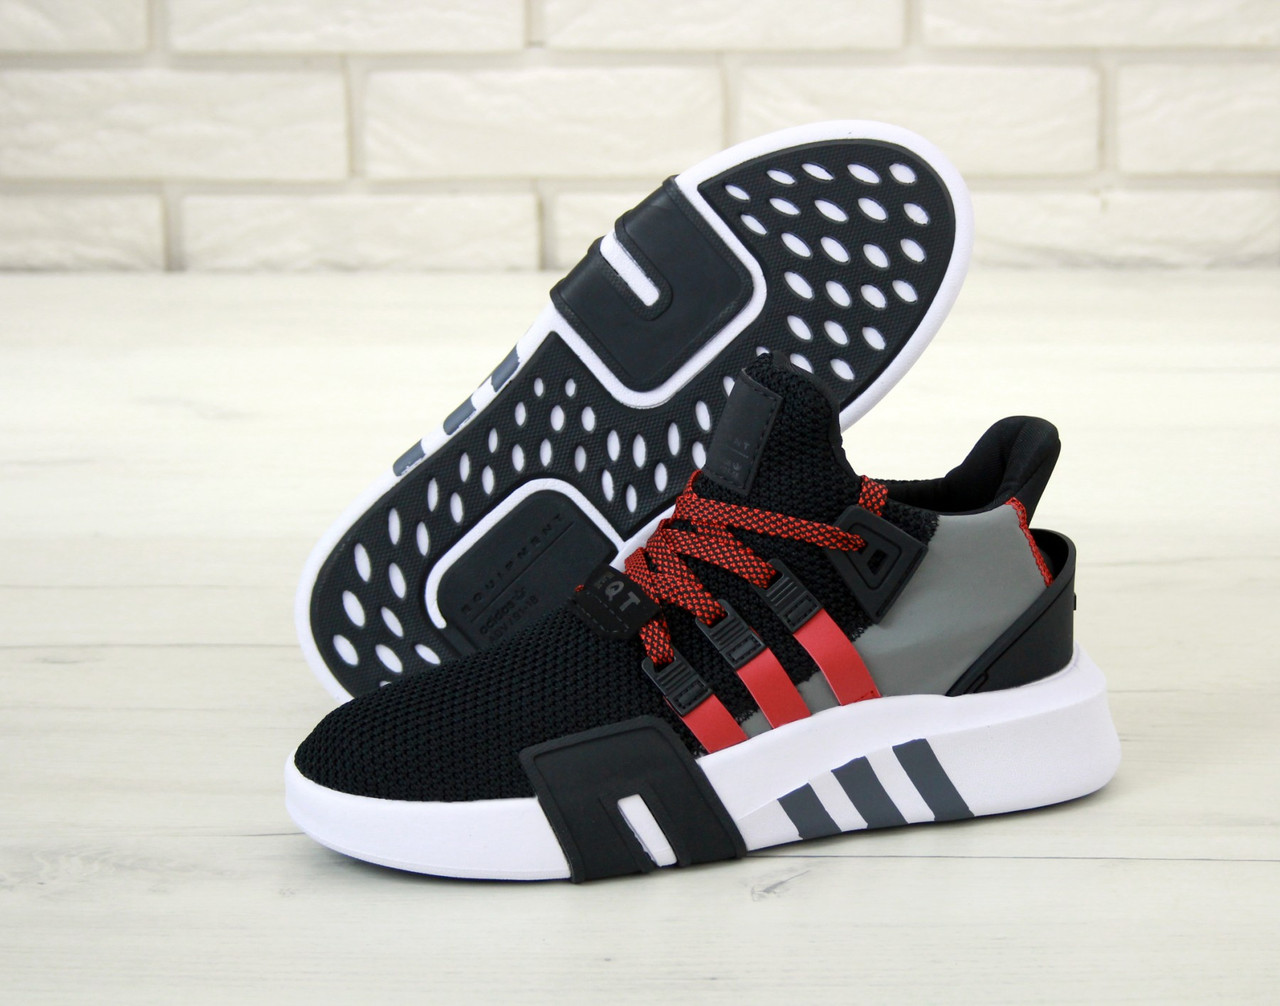 Мужские кроссовки Adidas EQT Basketball ADV Black  . ТОП Реплика ААА класса.